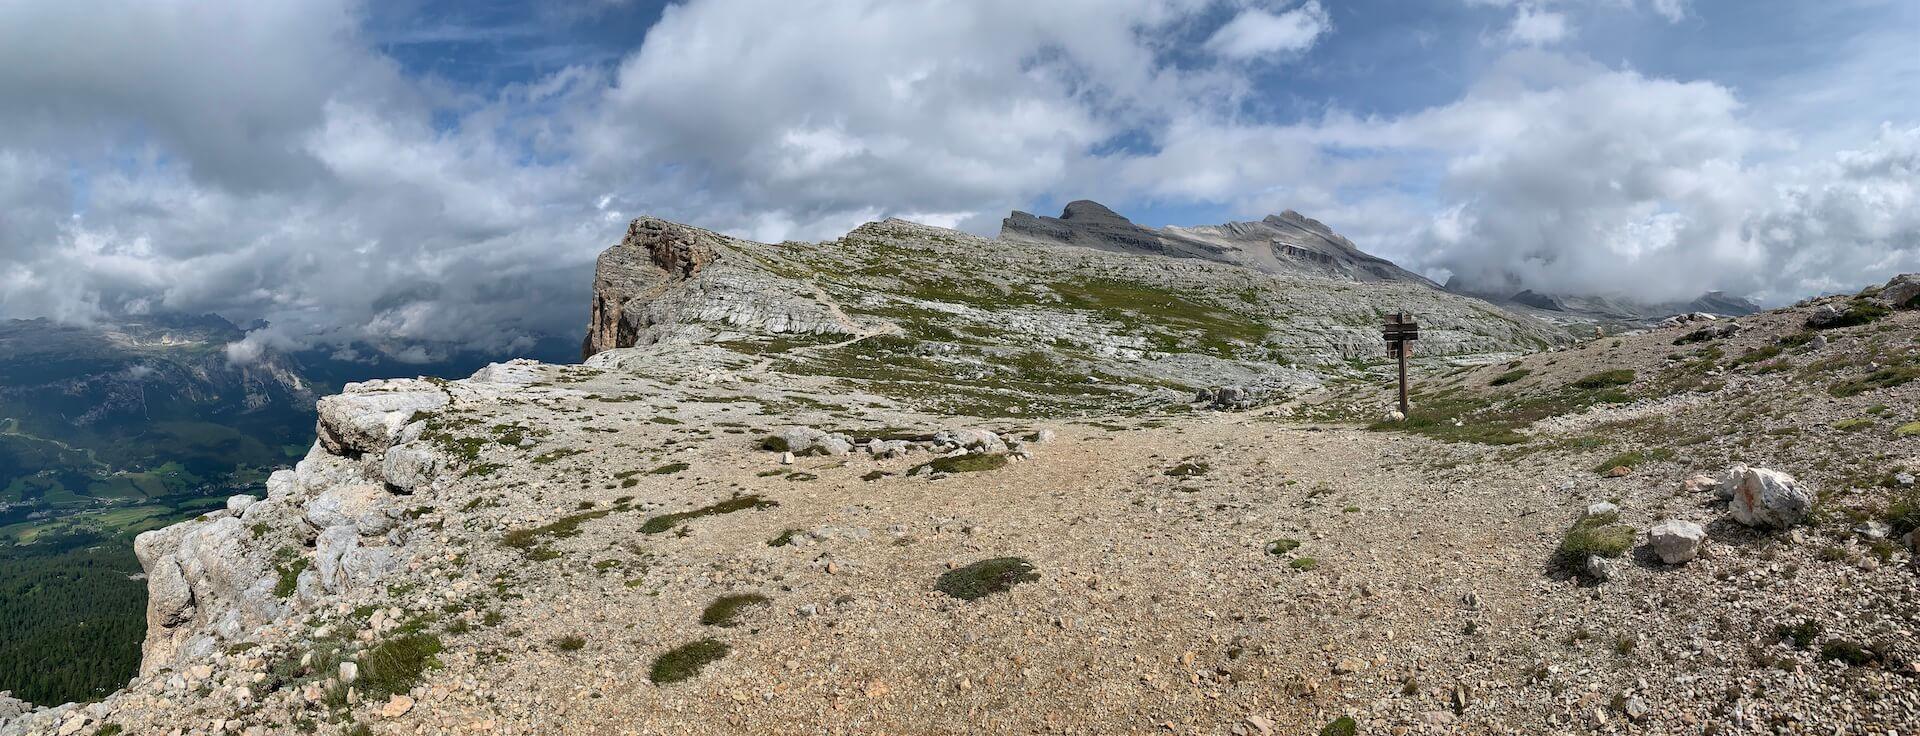 Dolomiten in Südtirol